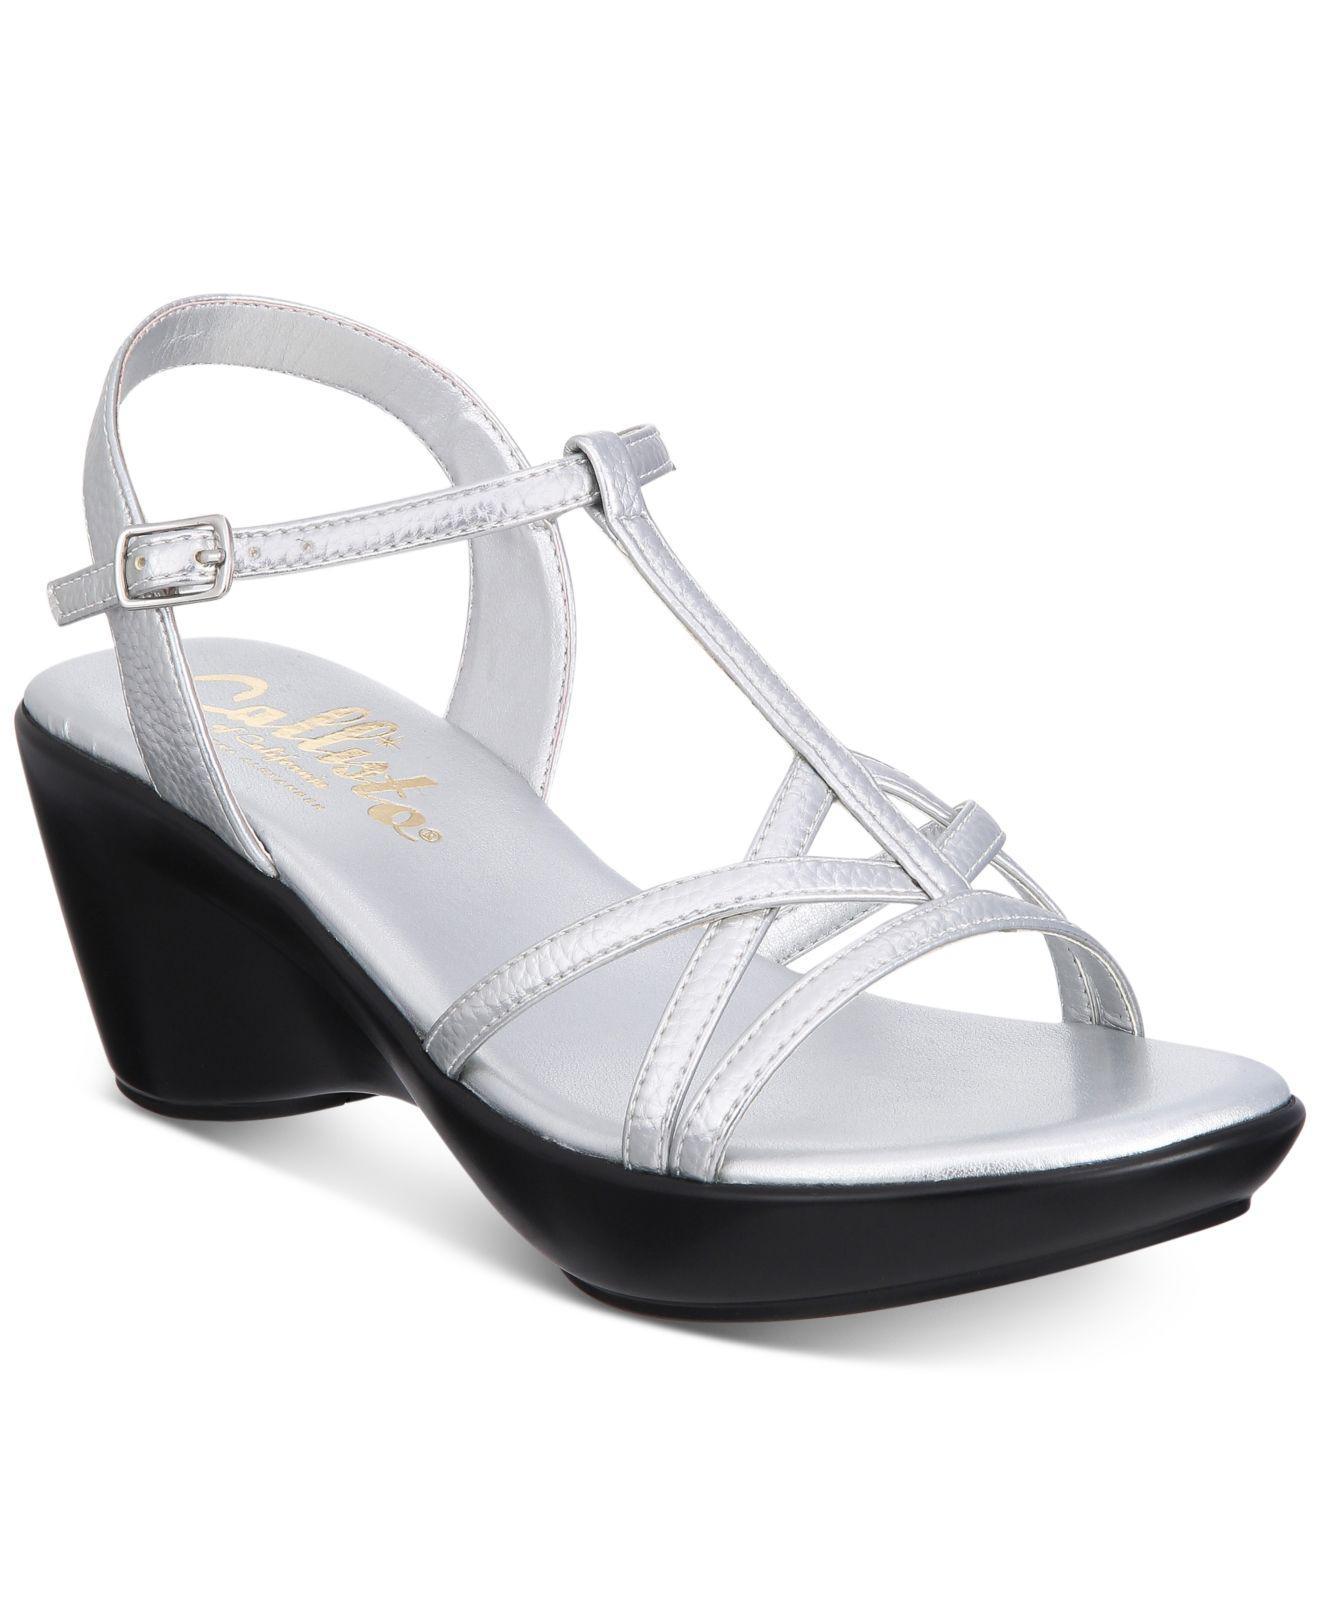 00b53ae48ea7 Lyst - Callisto Caressa Strappy Wedge Sandals in Metallic